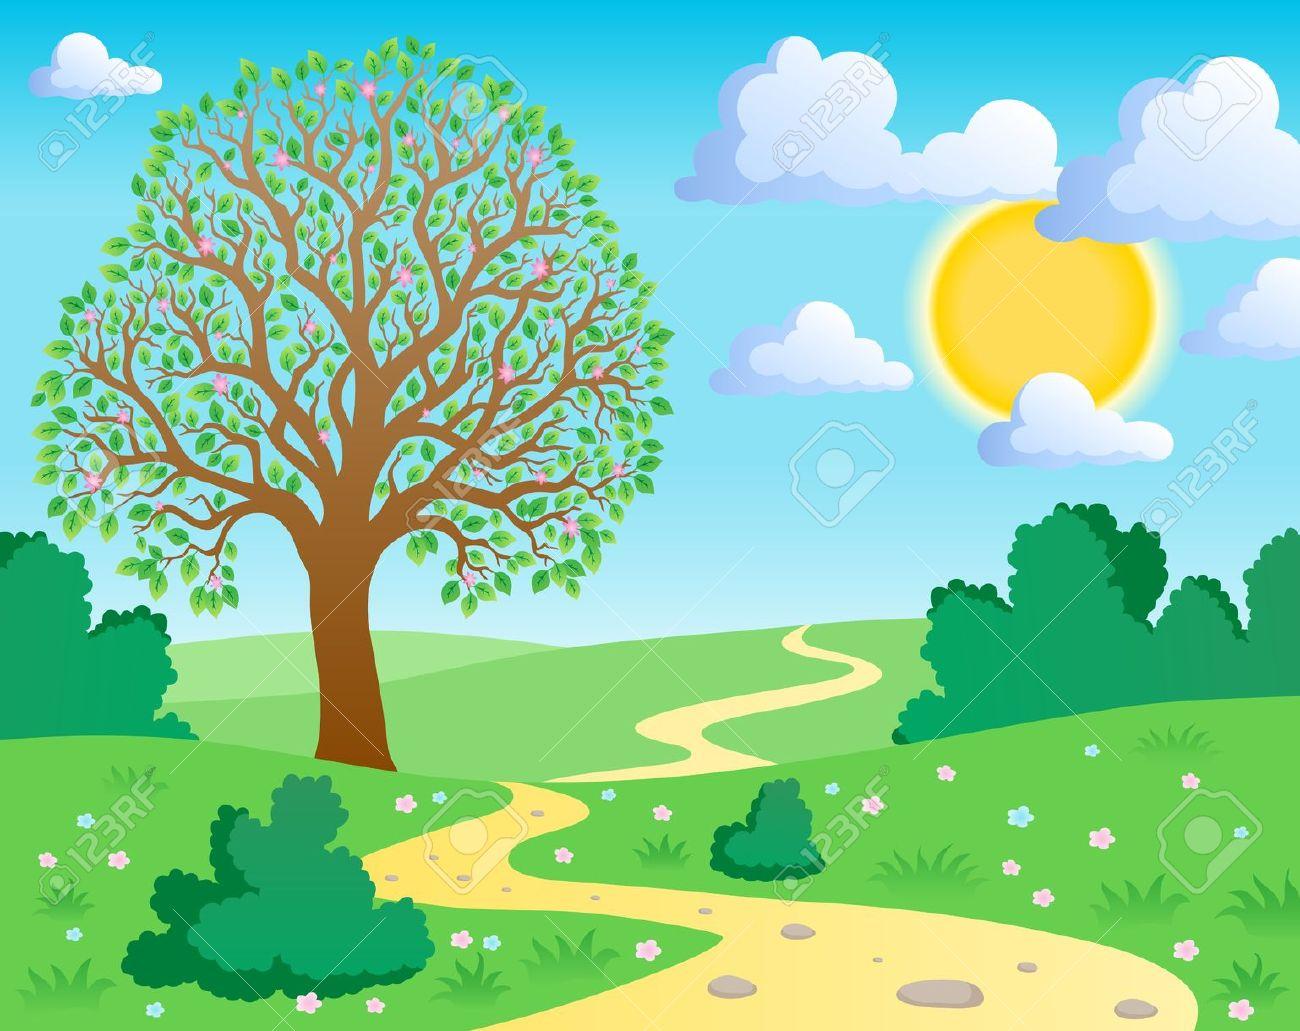 Nature clipart. Free scene cliparts download